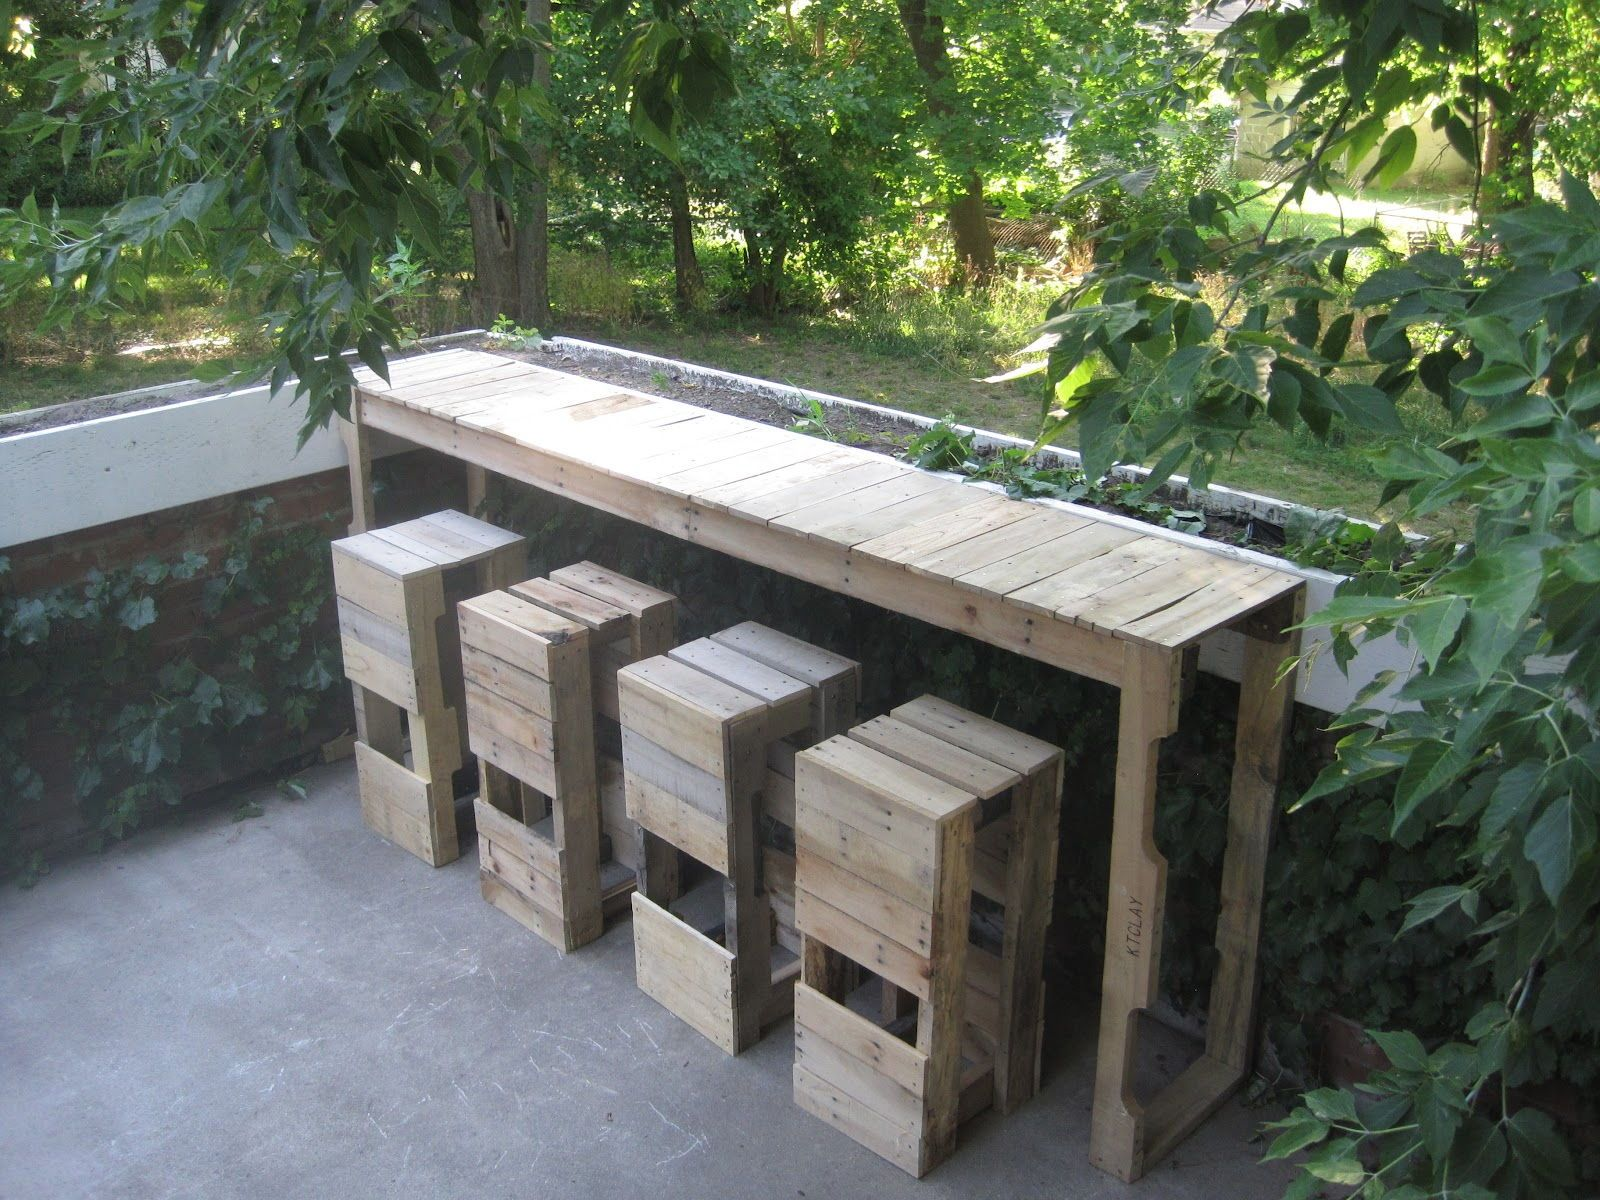 outdoor pallet furniture ideas. 30+ Creative Pallet Furniture DIY Ideas And Projects Outdoor